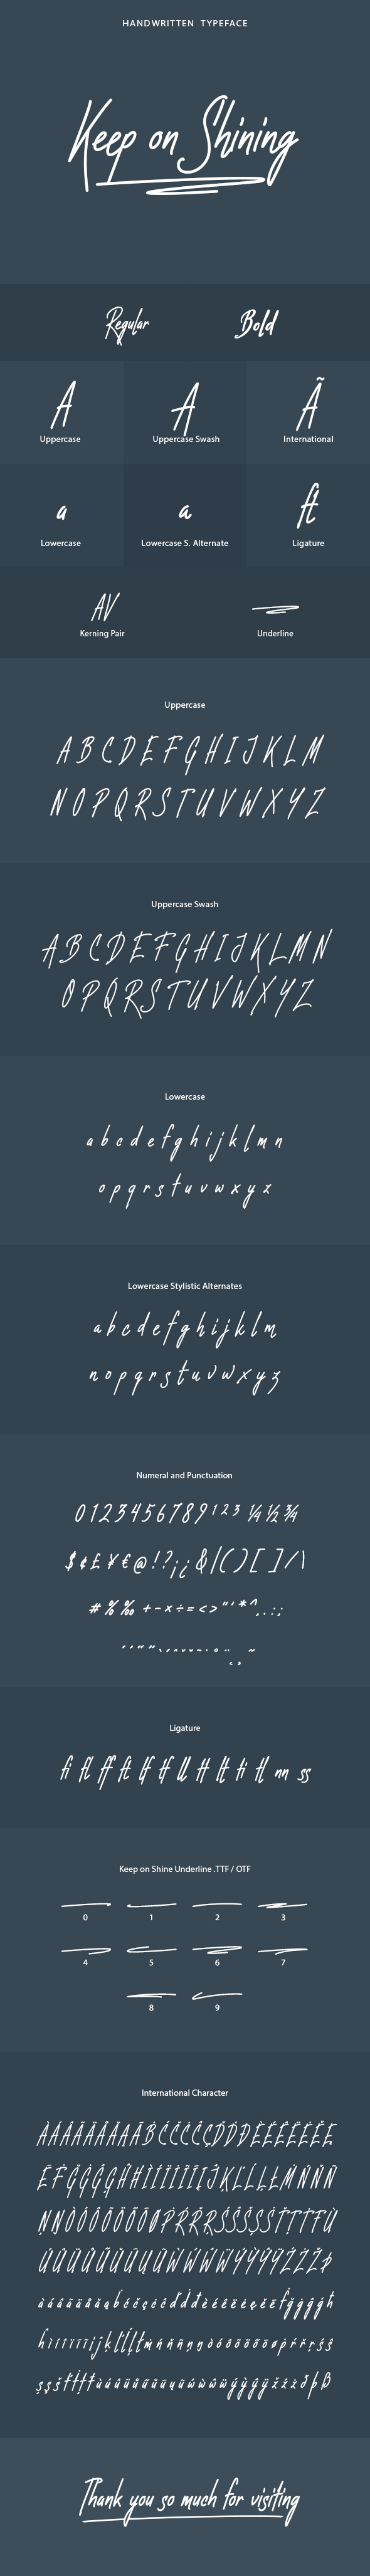 Keep on Shining Font - Hand-writing Script